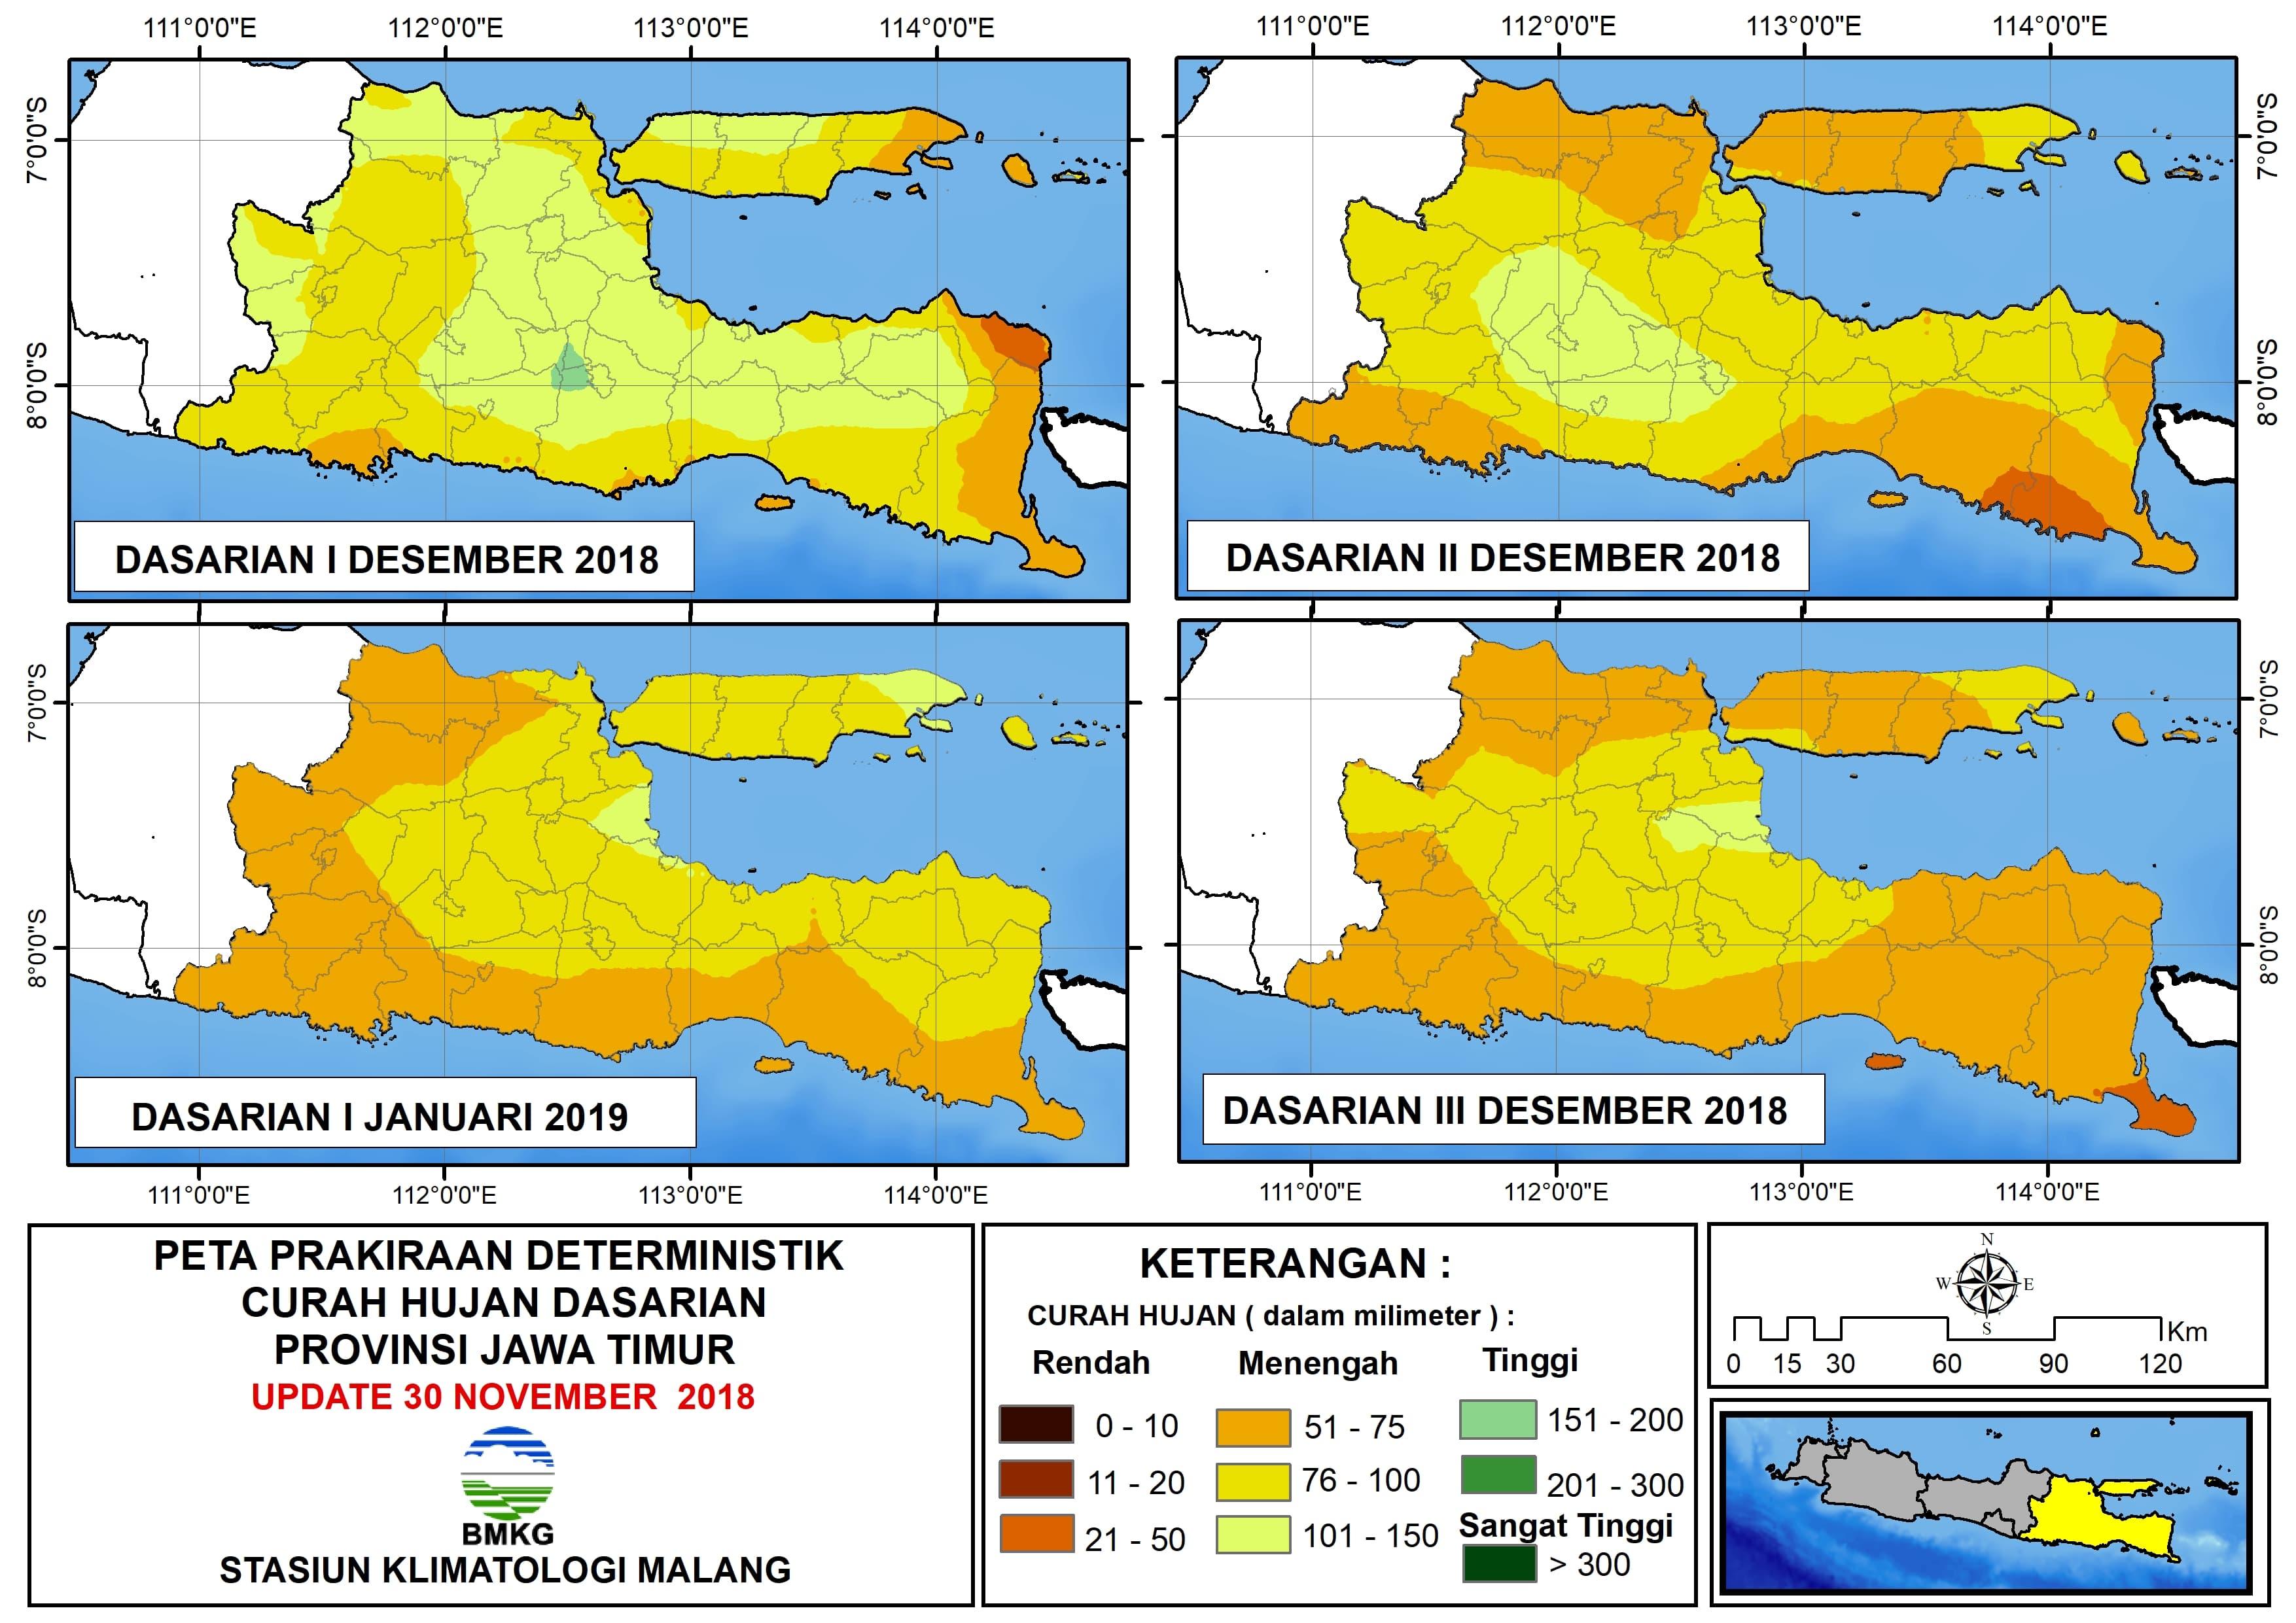 Peta Prakiraan Deterministik Curah Hujan Dasarian Provinsi Jawa Timur Update 30 November 2018